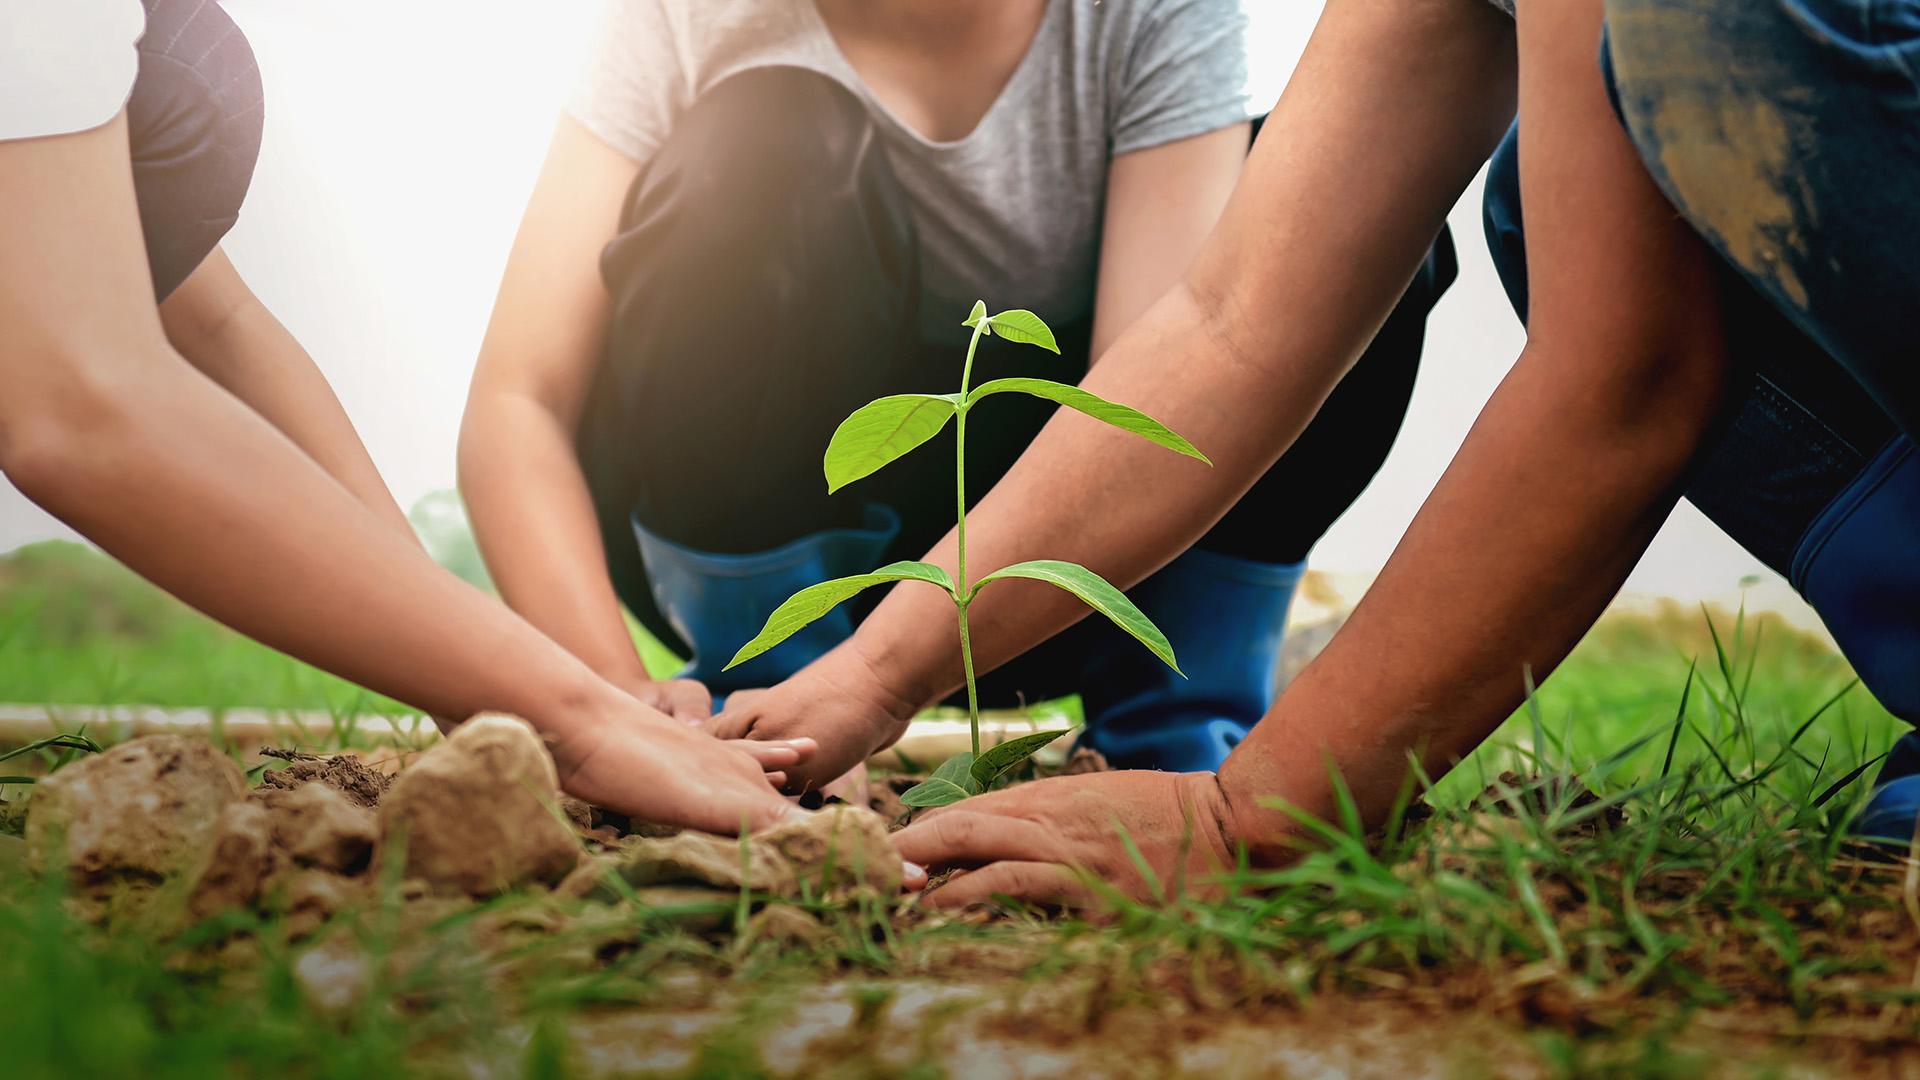 Klima- & Umweltschutz